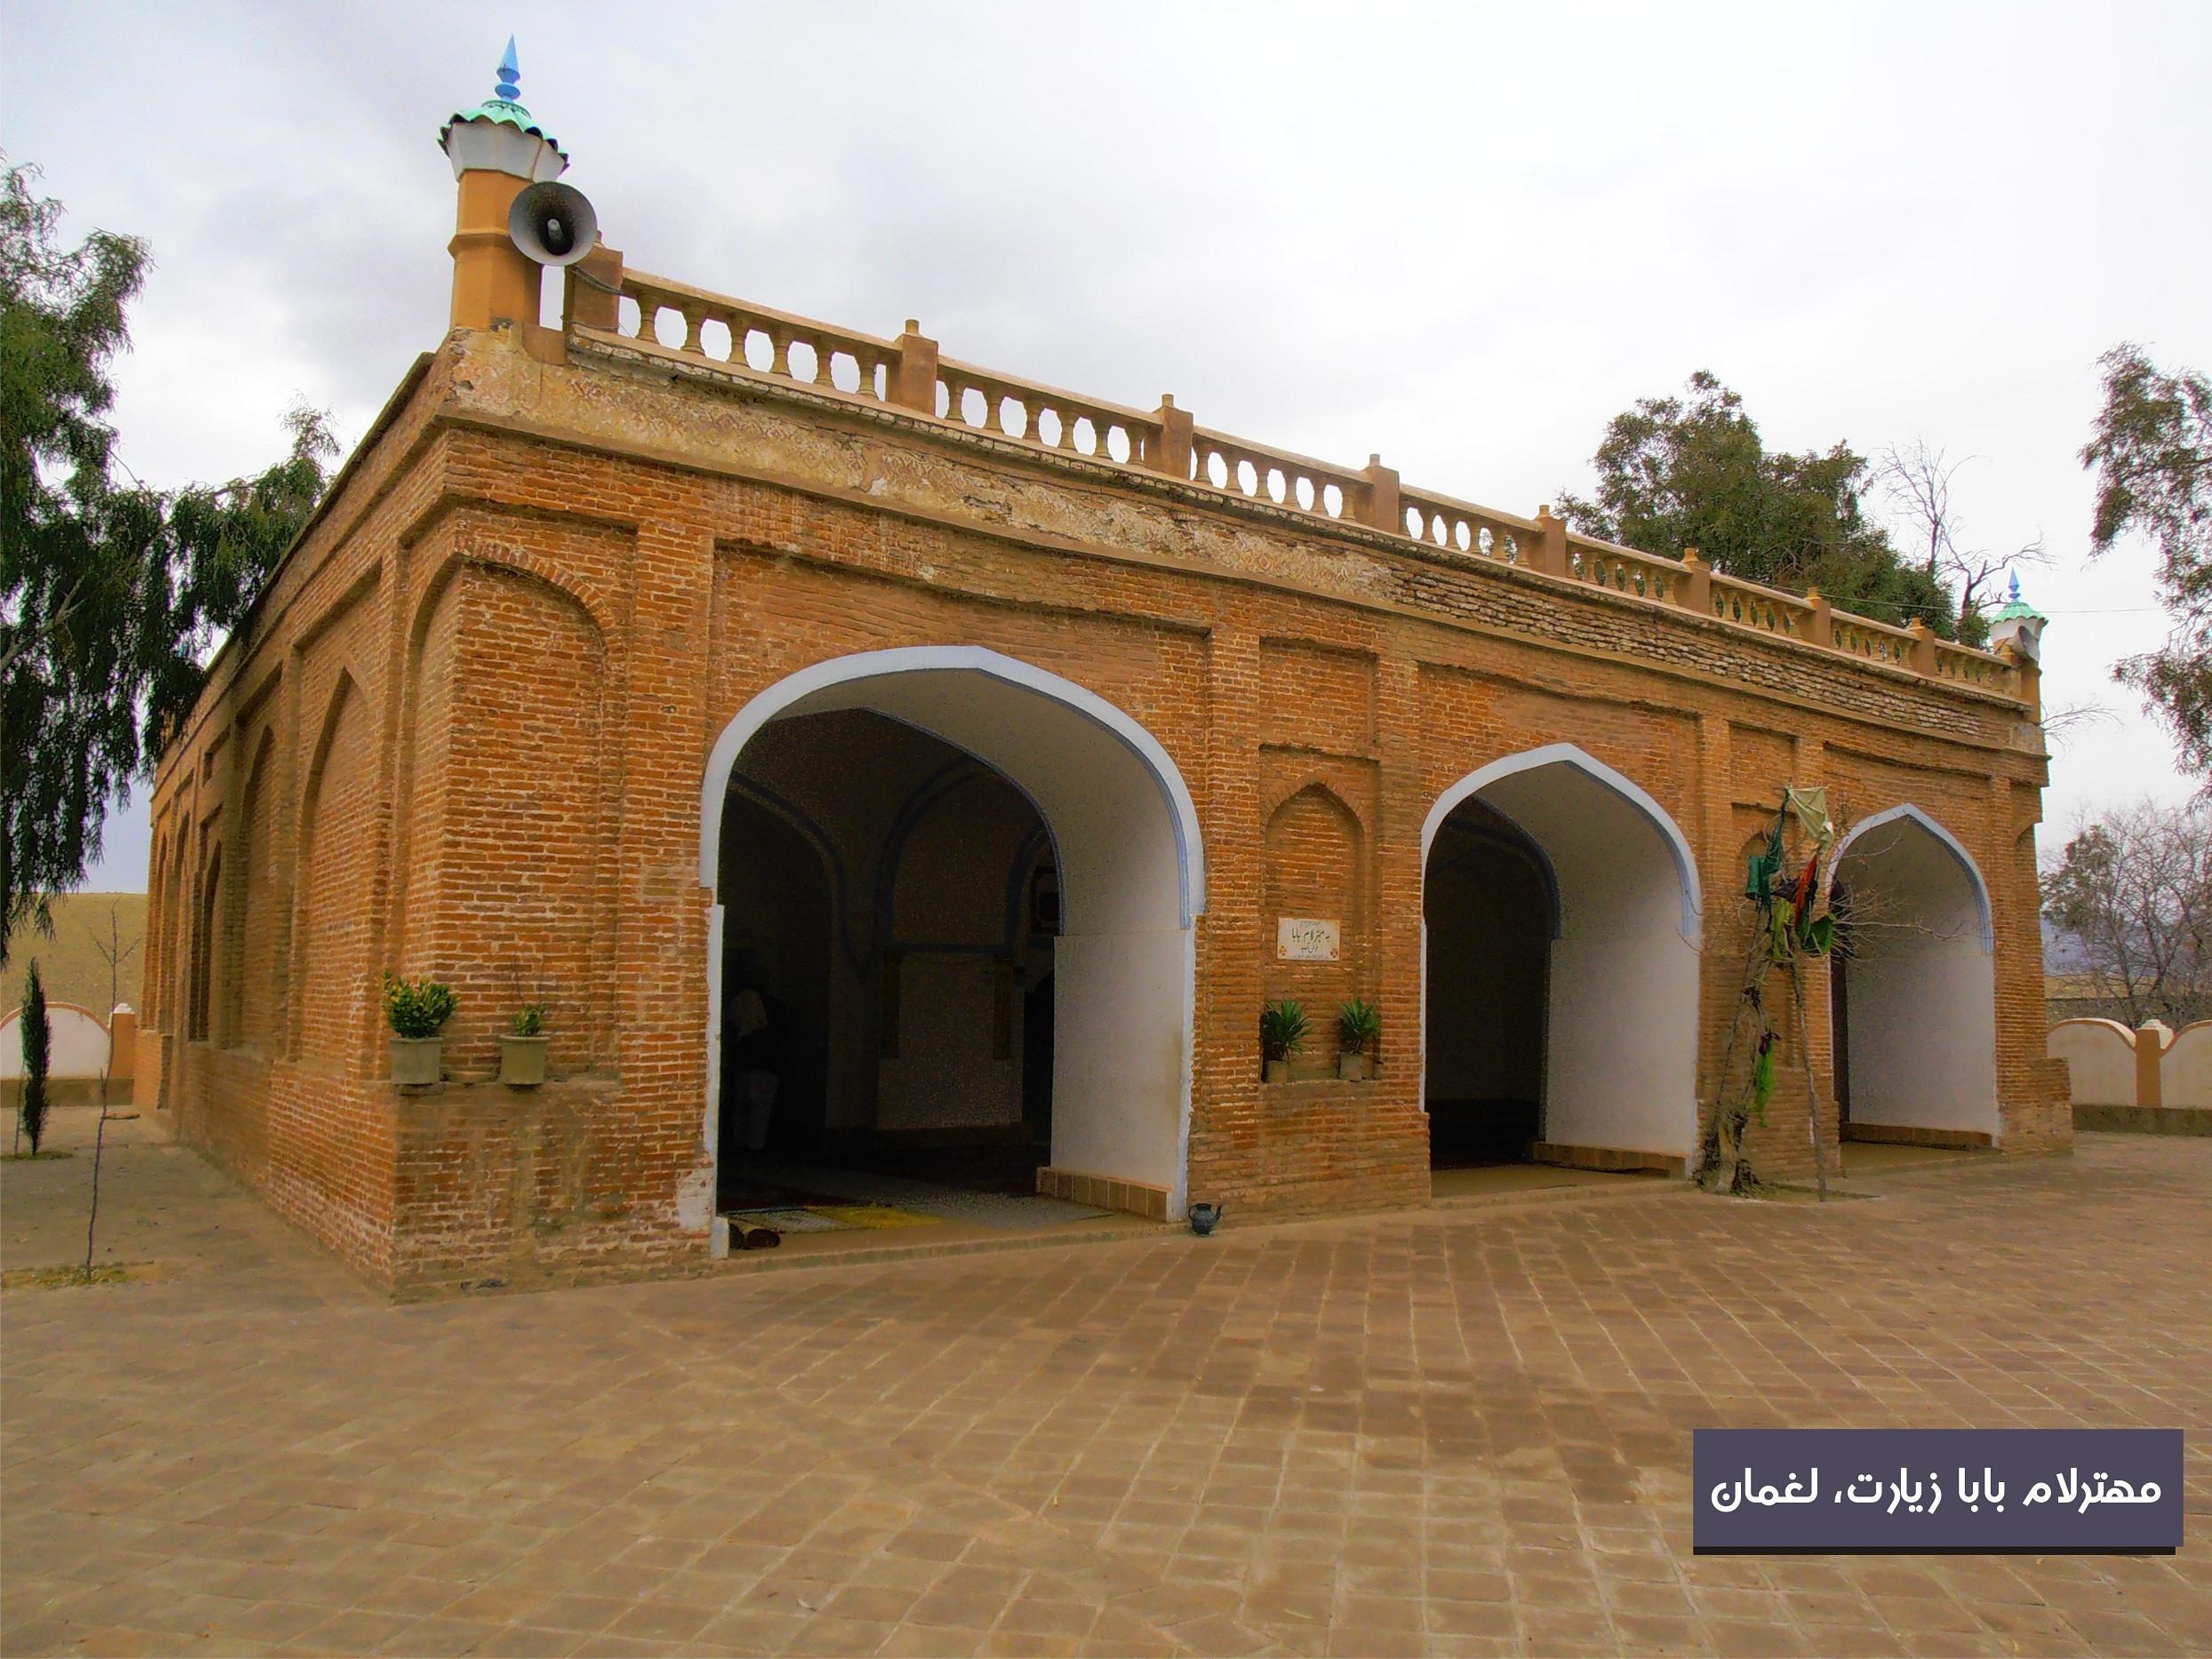 Mehterlam-Baba